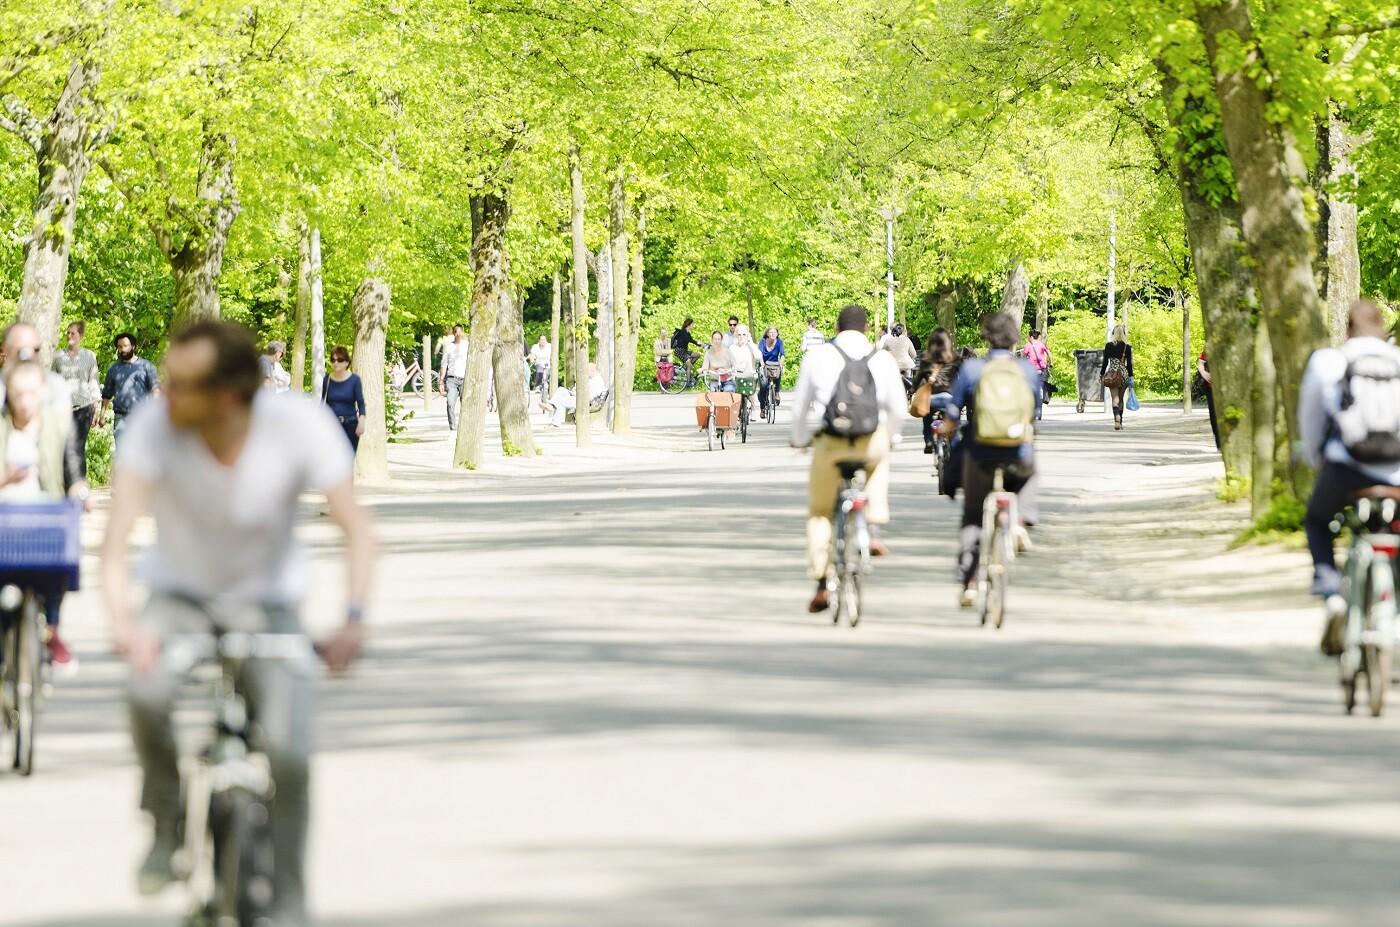 Zonas verdes en Madrid